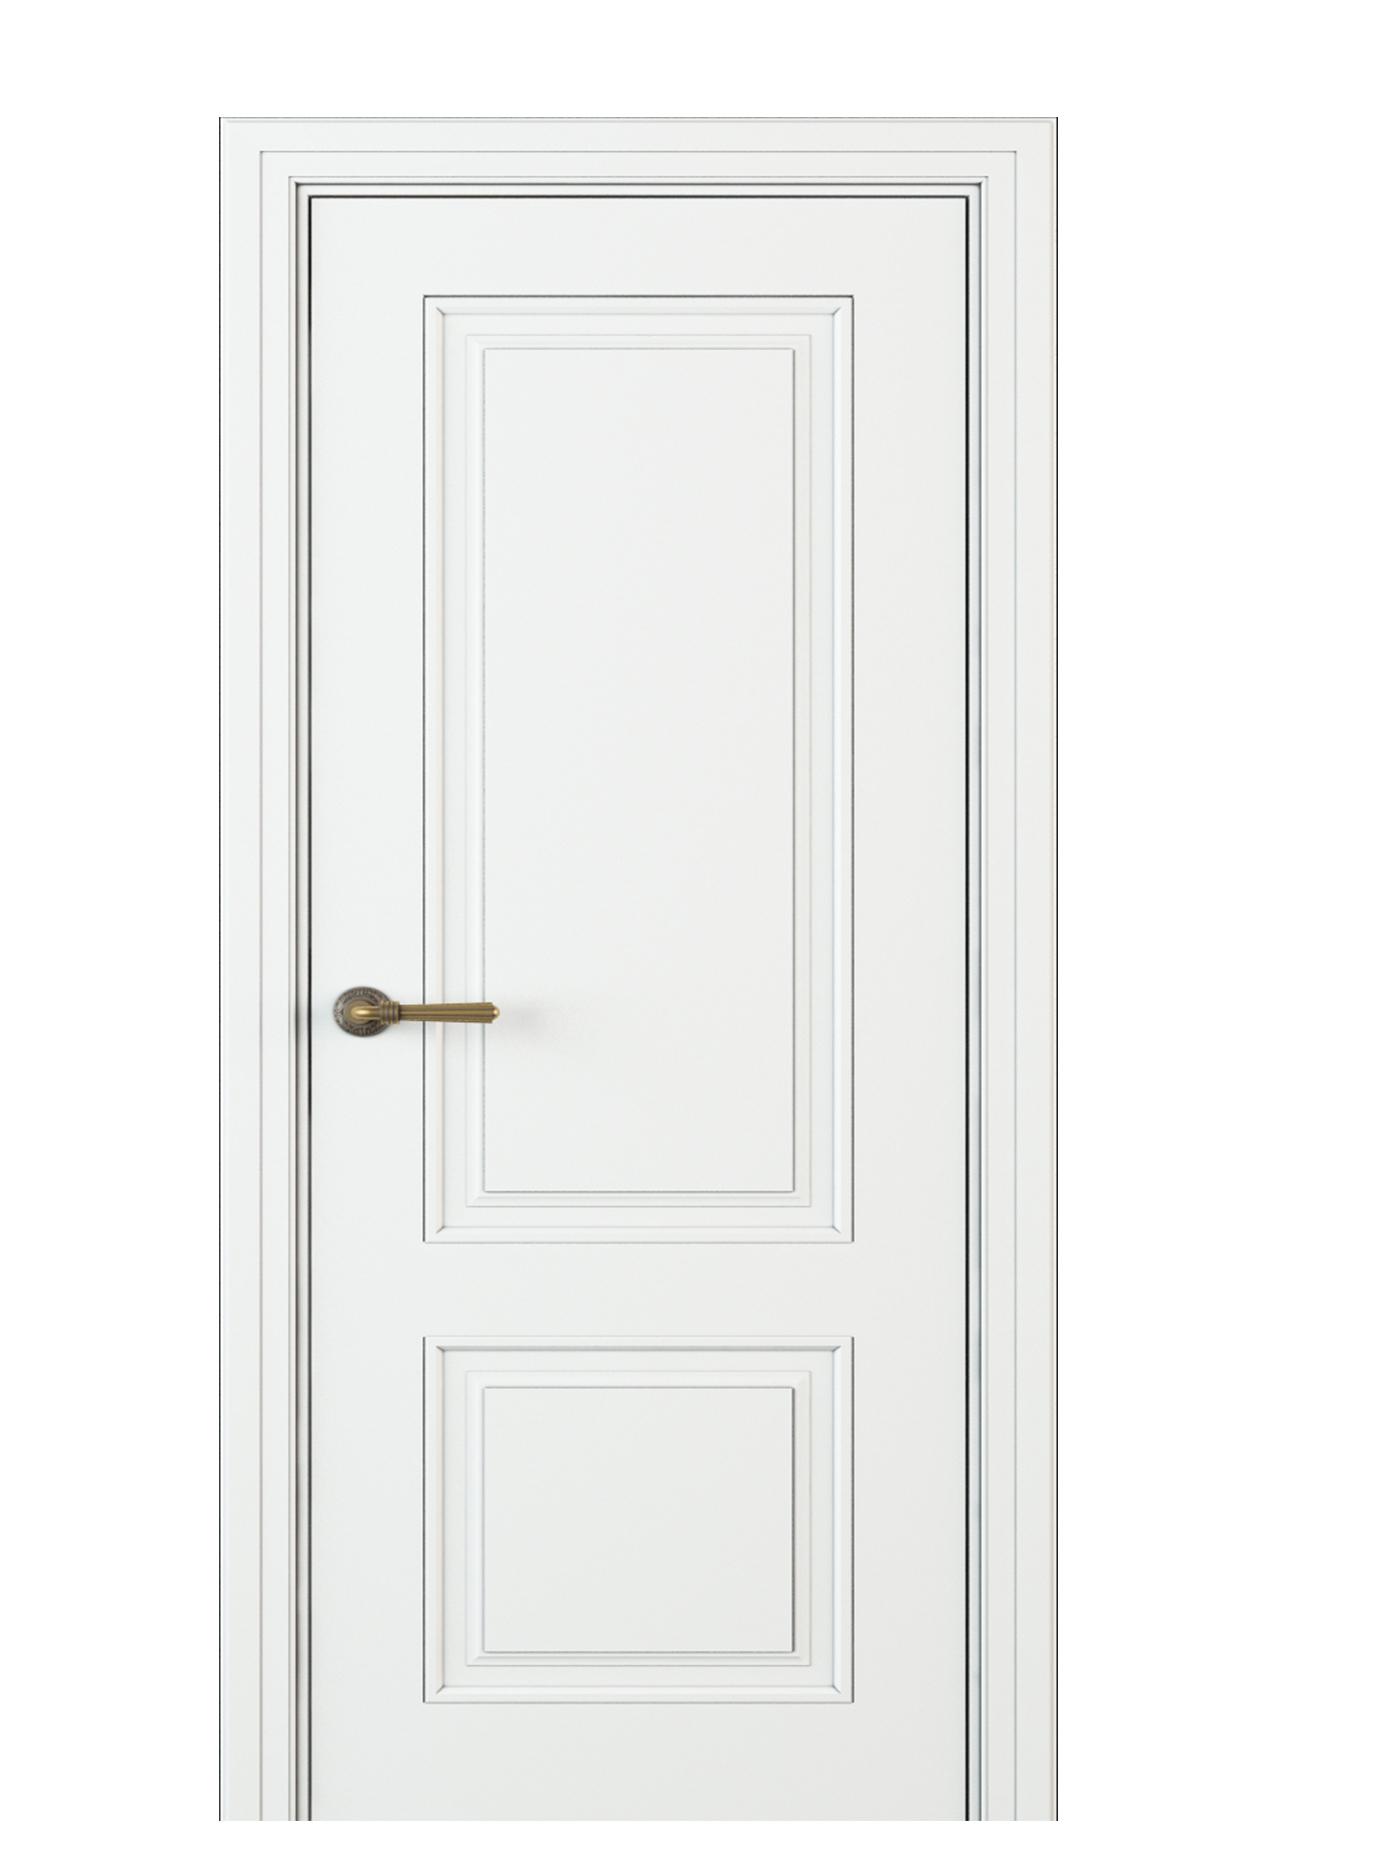 Image Donori Interior Door Italian Enamel White 0